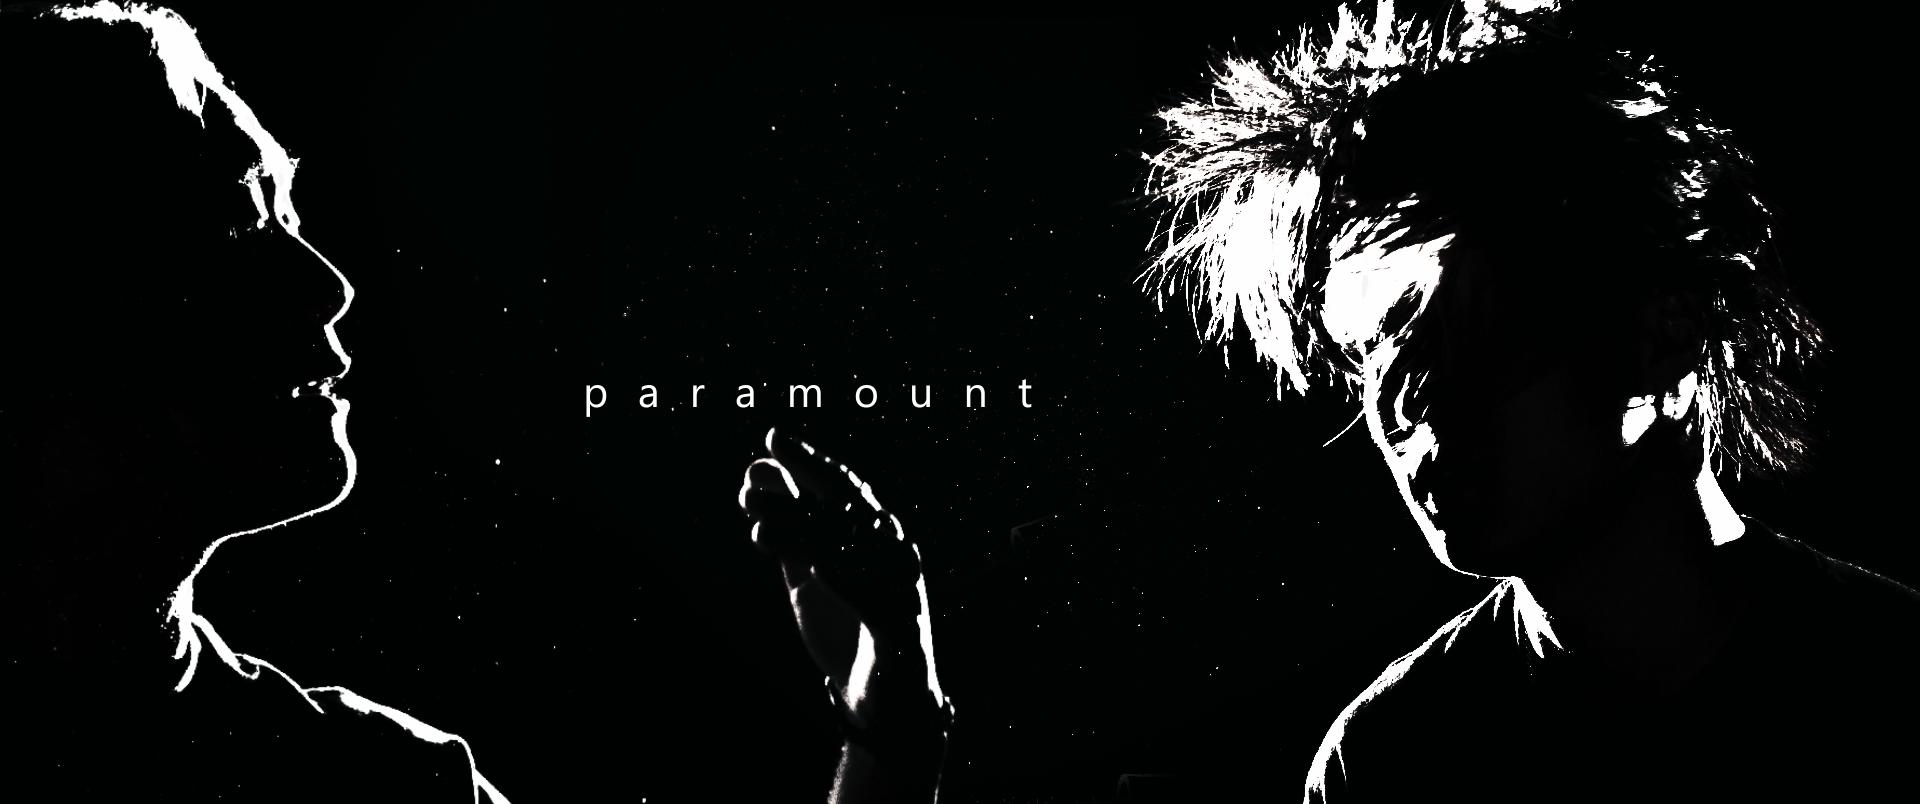 Paramount_DAVID (0-00-44-19).png